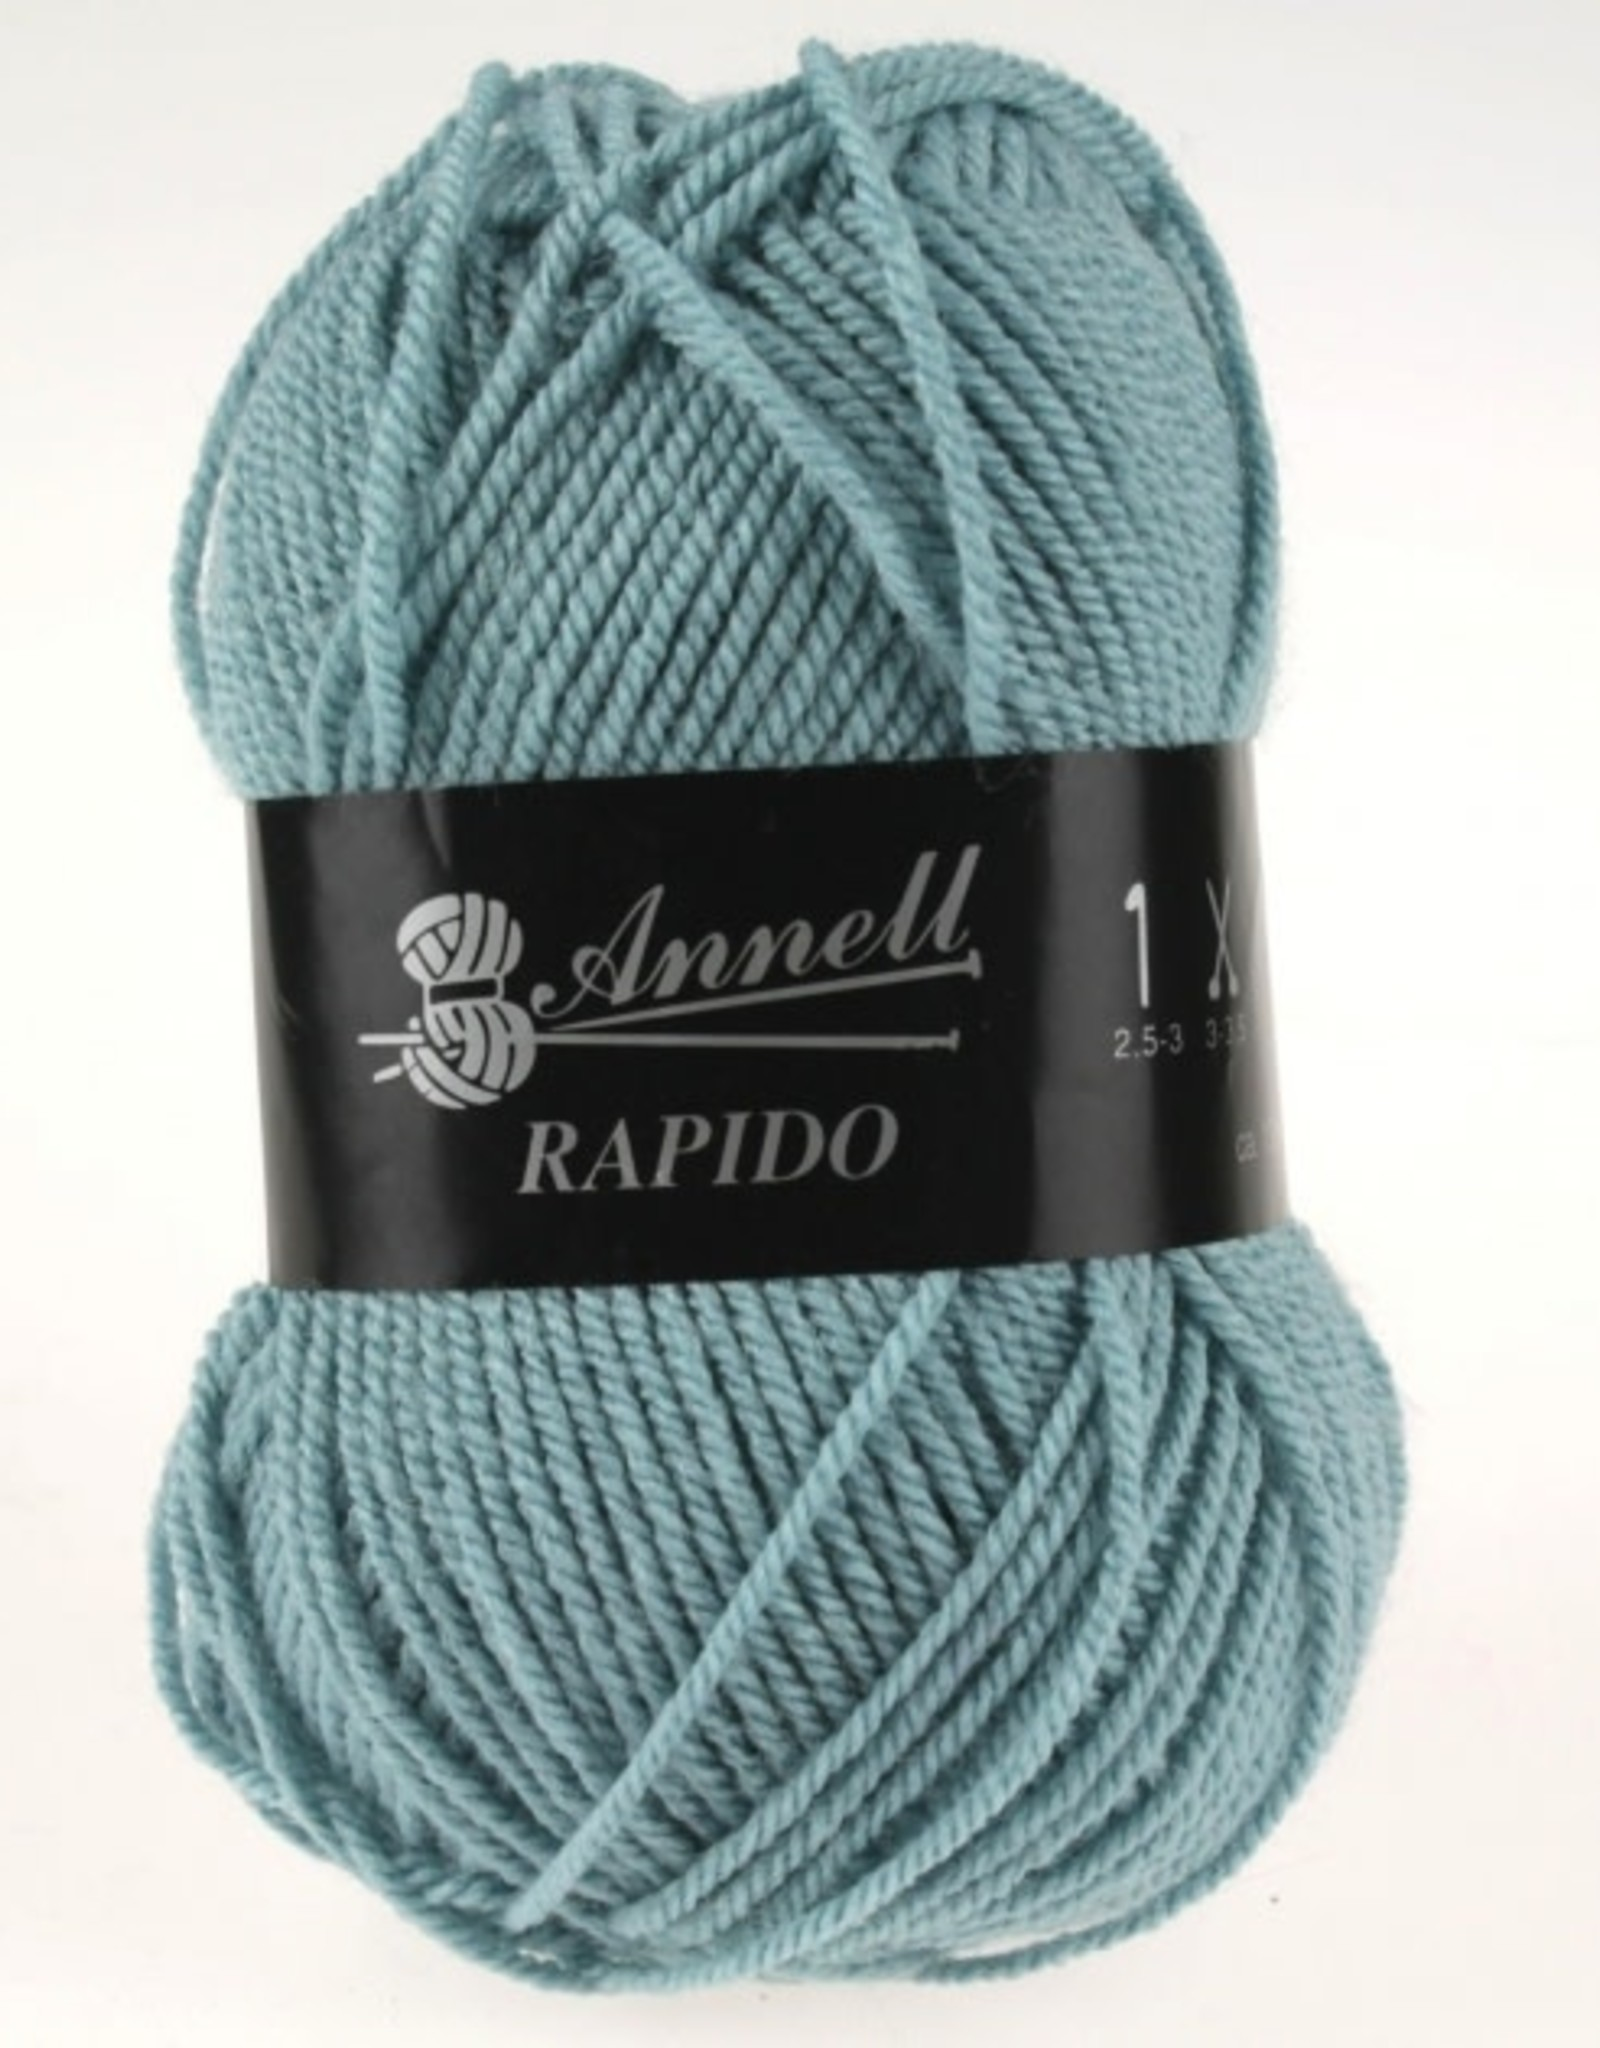 Annell Annell rapido 3225